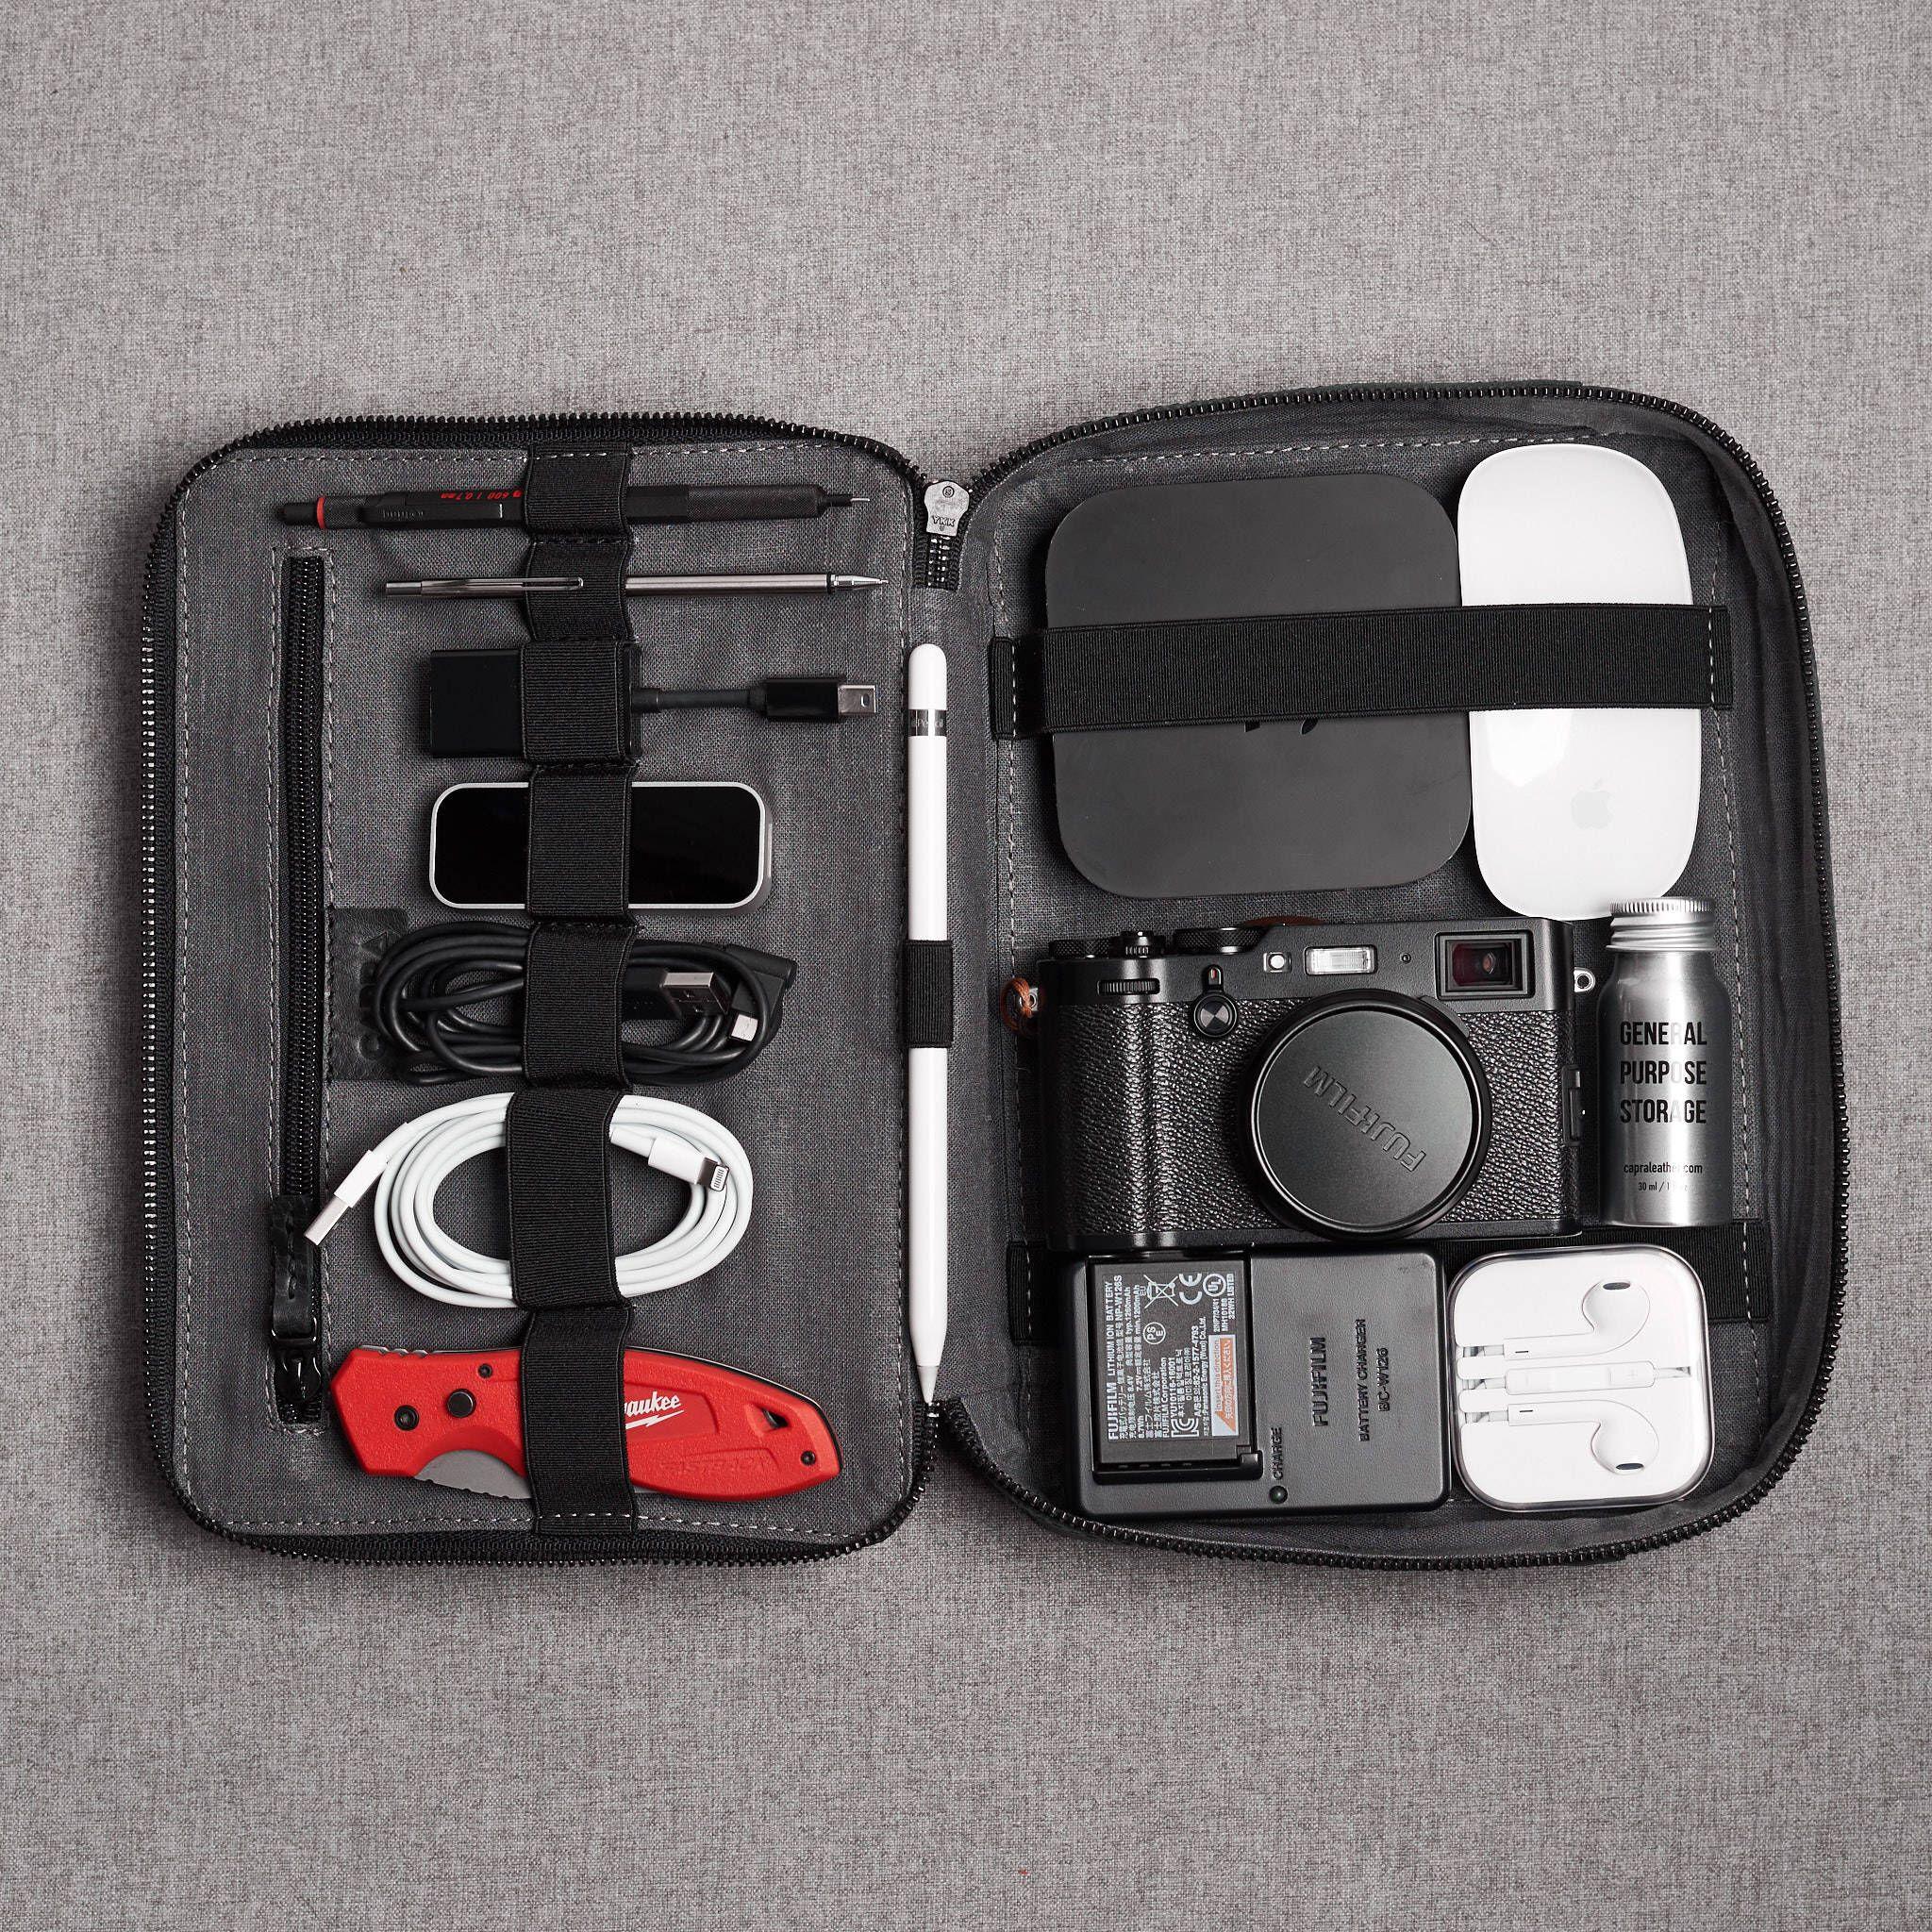 4e6e83fc121 Black leather Gadget Travel Bag, iPad leather bag, tech dopp kit, cable ties